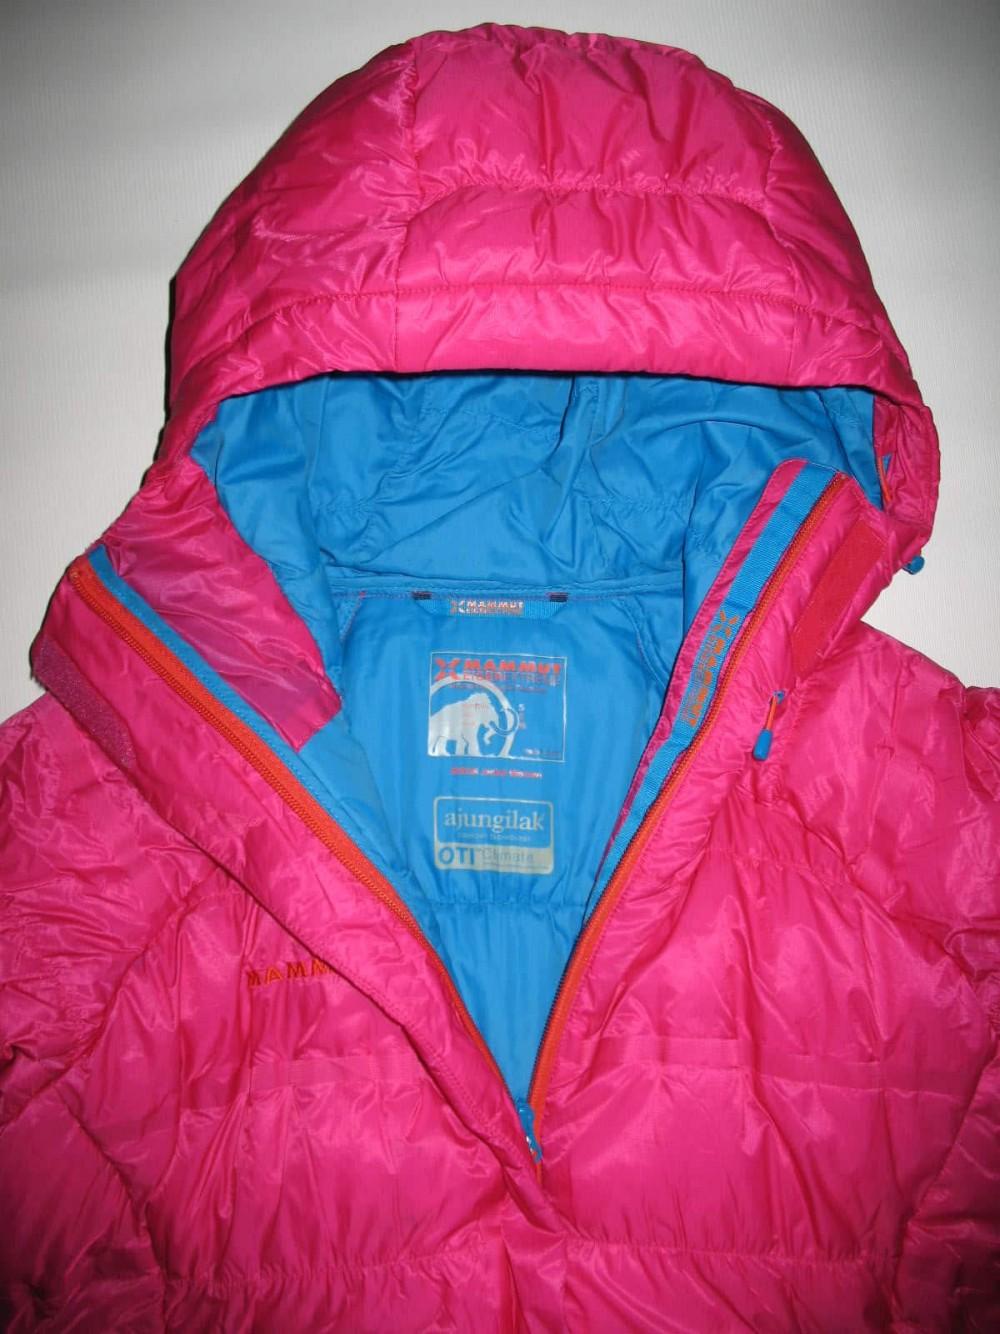 Куртка MAMMUT biwak eiger extreme jacket lady (размер S/M) - 5